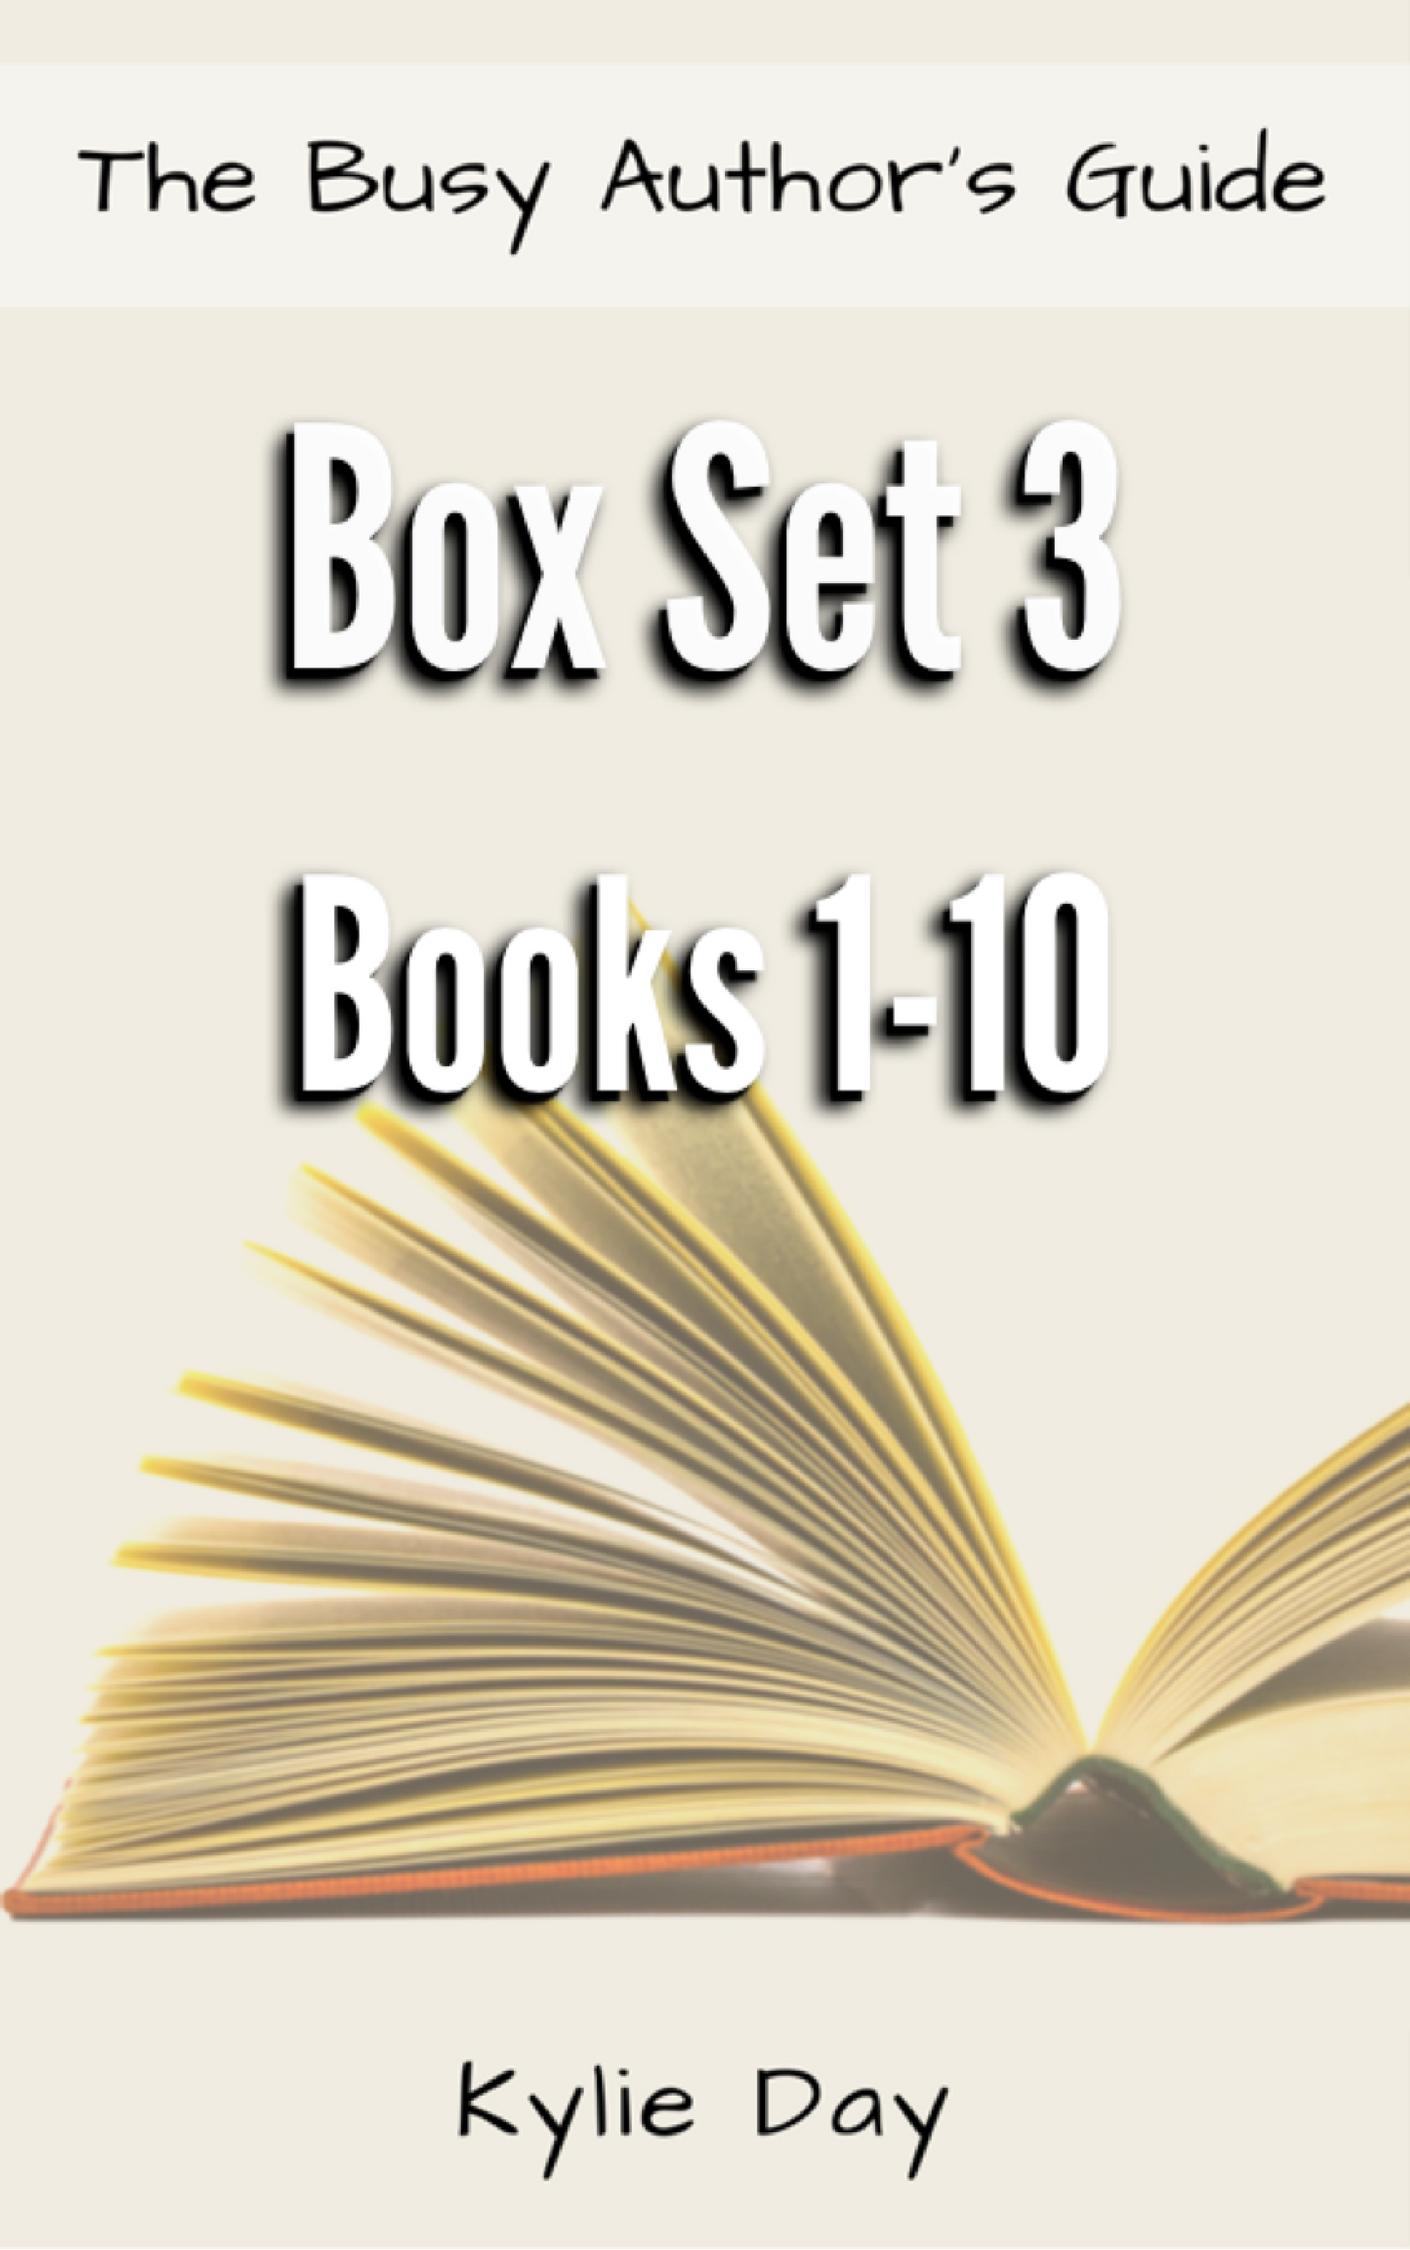 Box Set 3, books 1-10.png